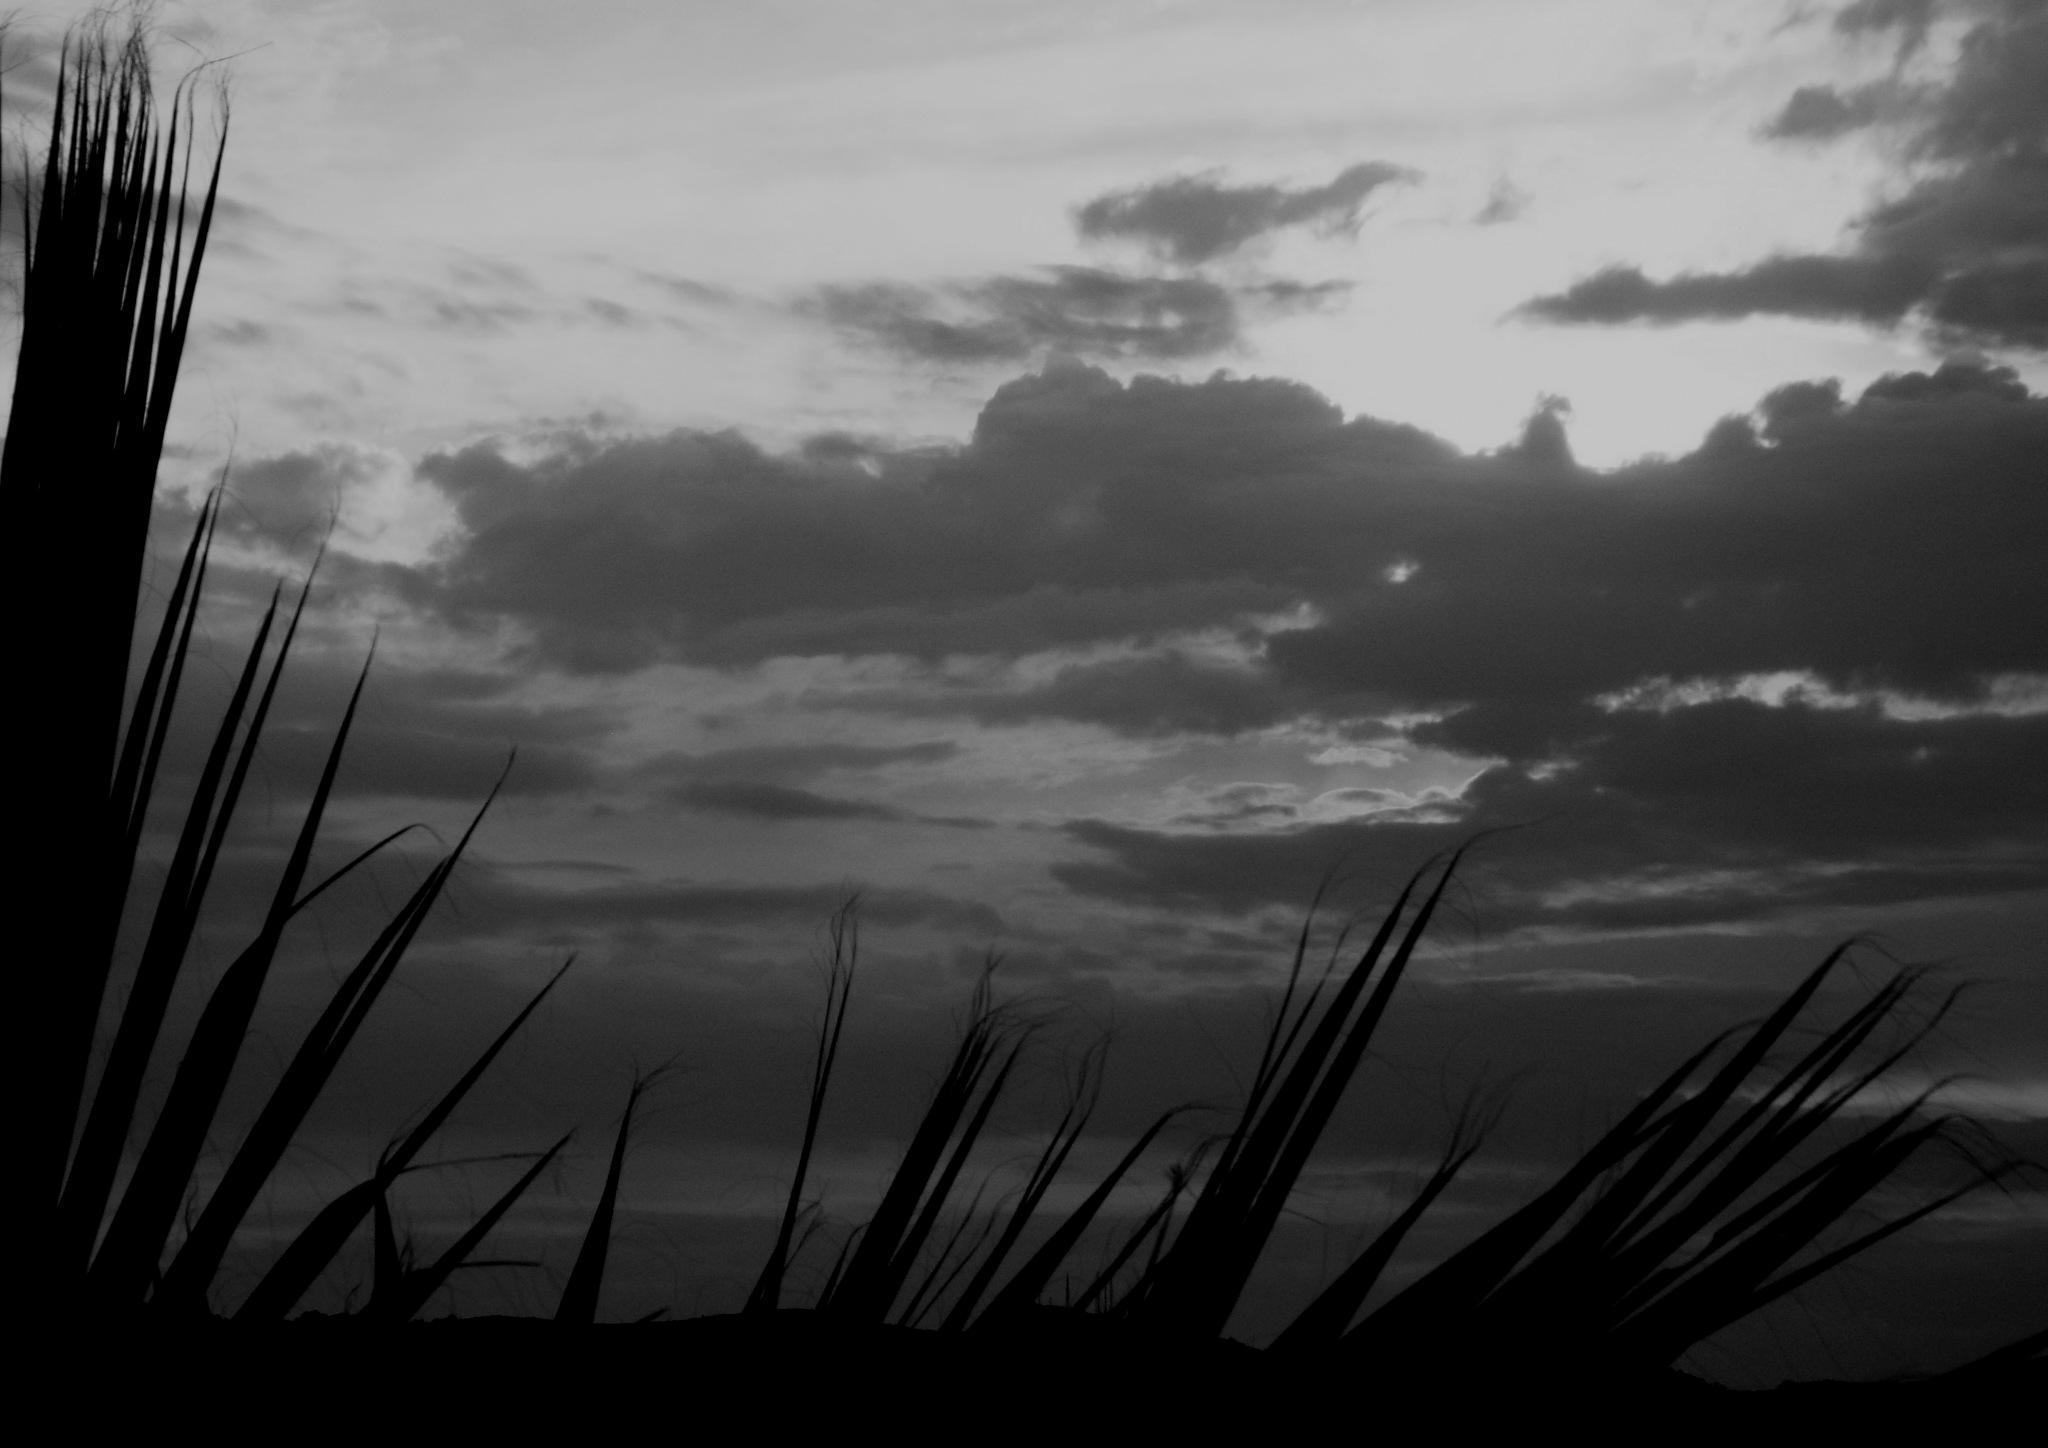 B&W SUNSET, BITEZ by Akin Saner